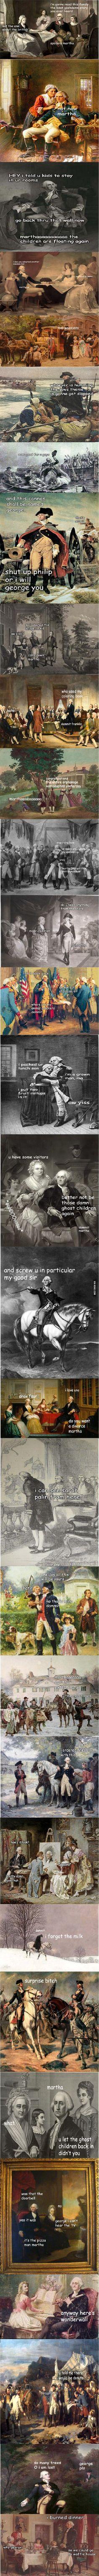 Adventures with George Washington, Part 2